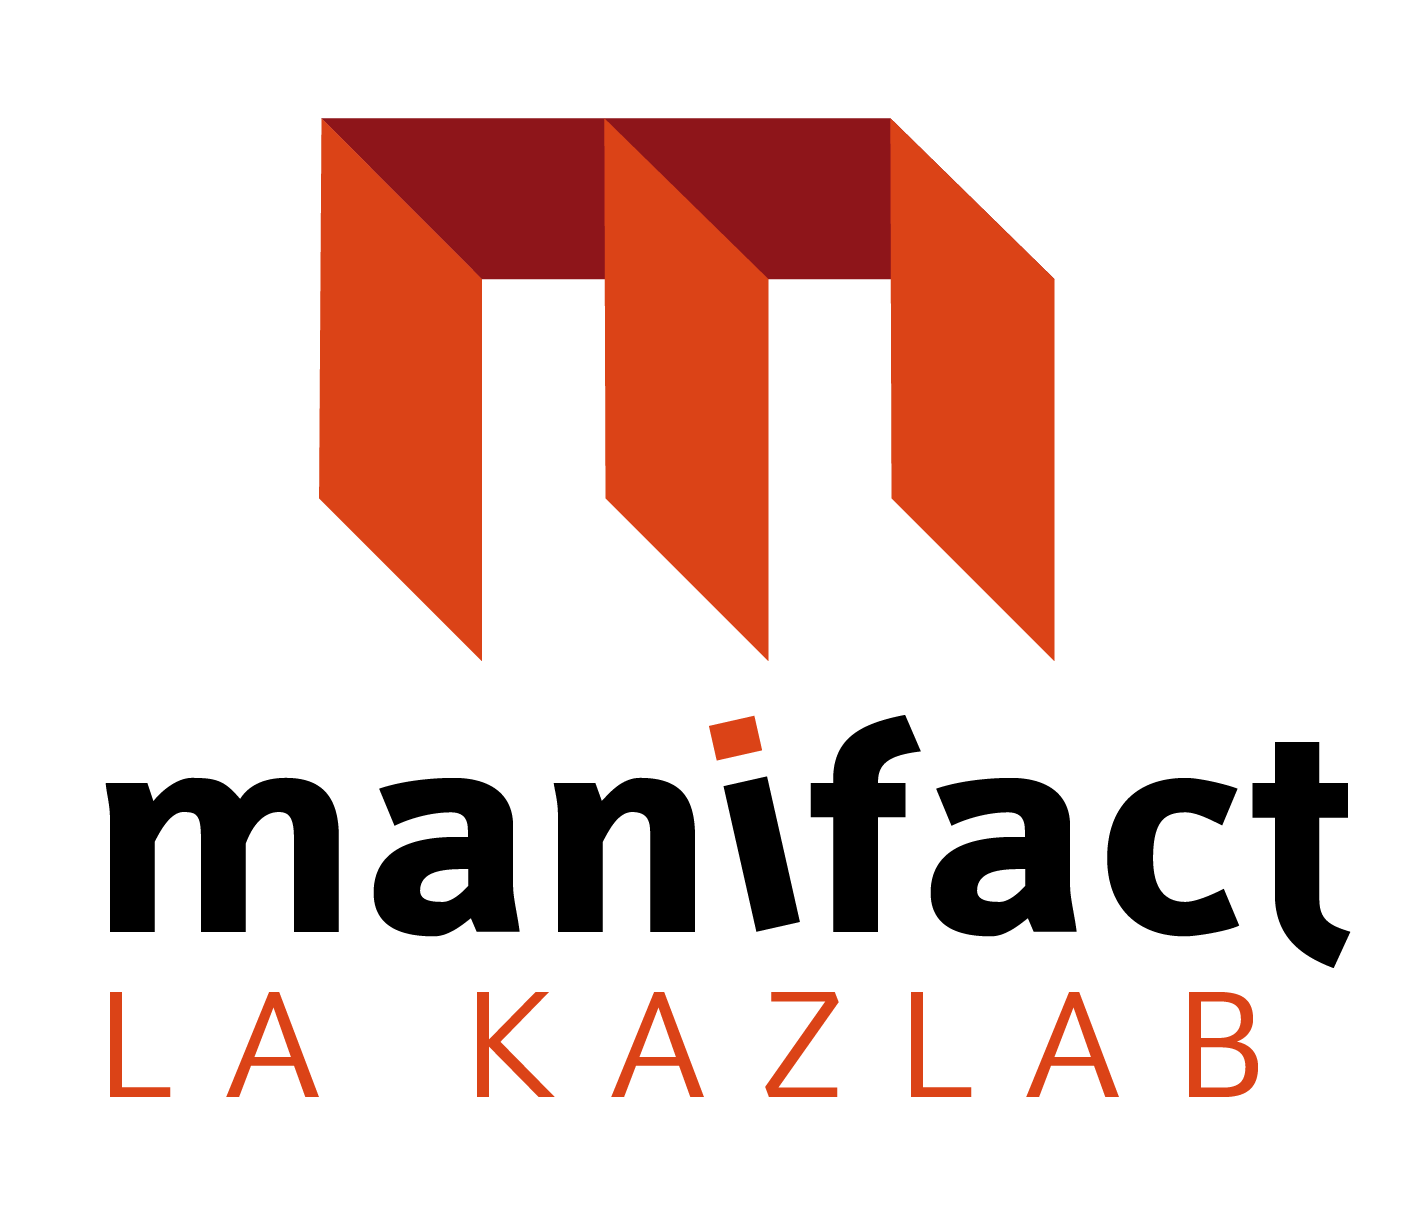 Group MANIFACT - La KazLab logo1-manifact-lakazlab widocreation-01.png